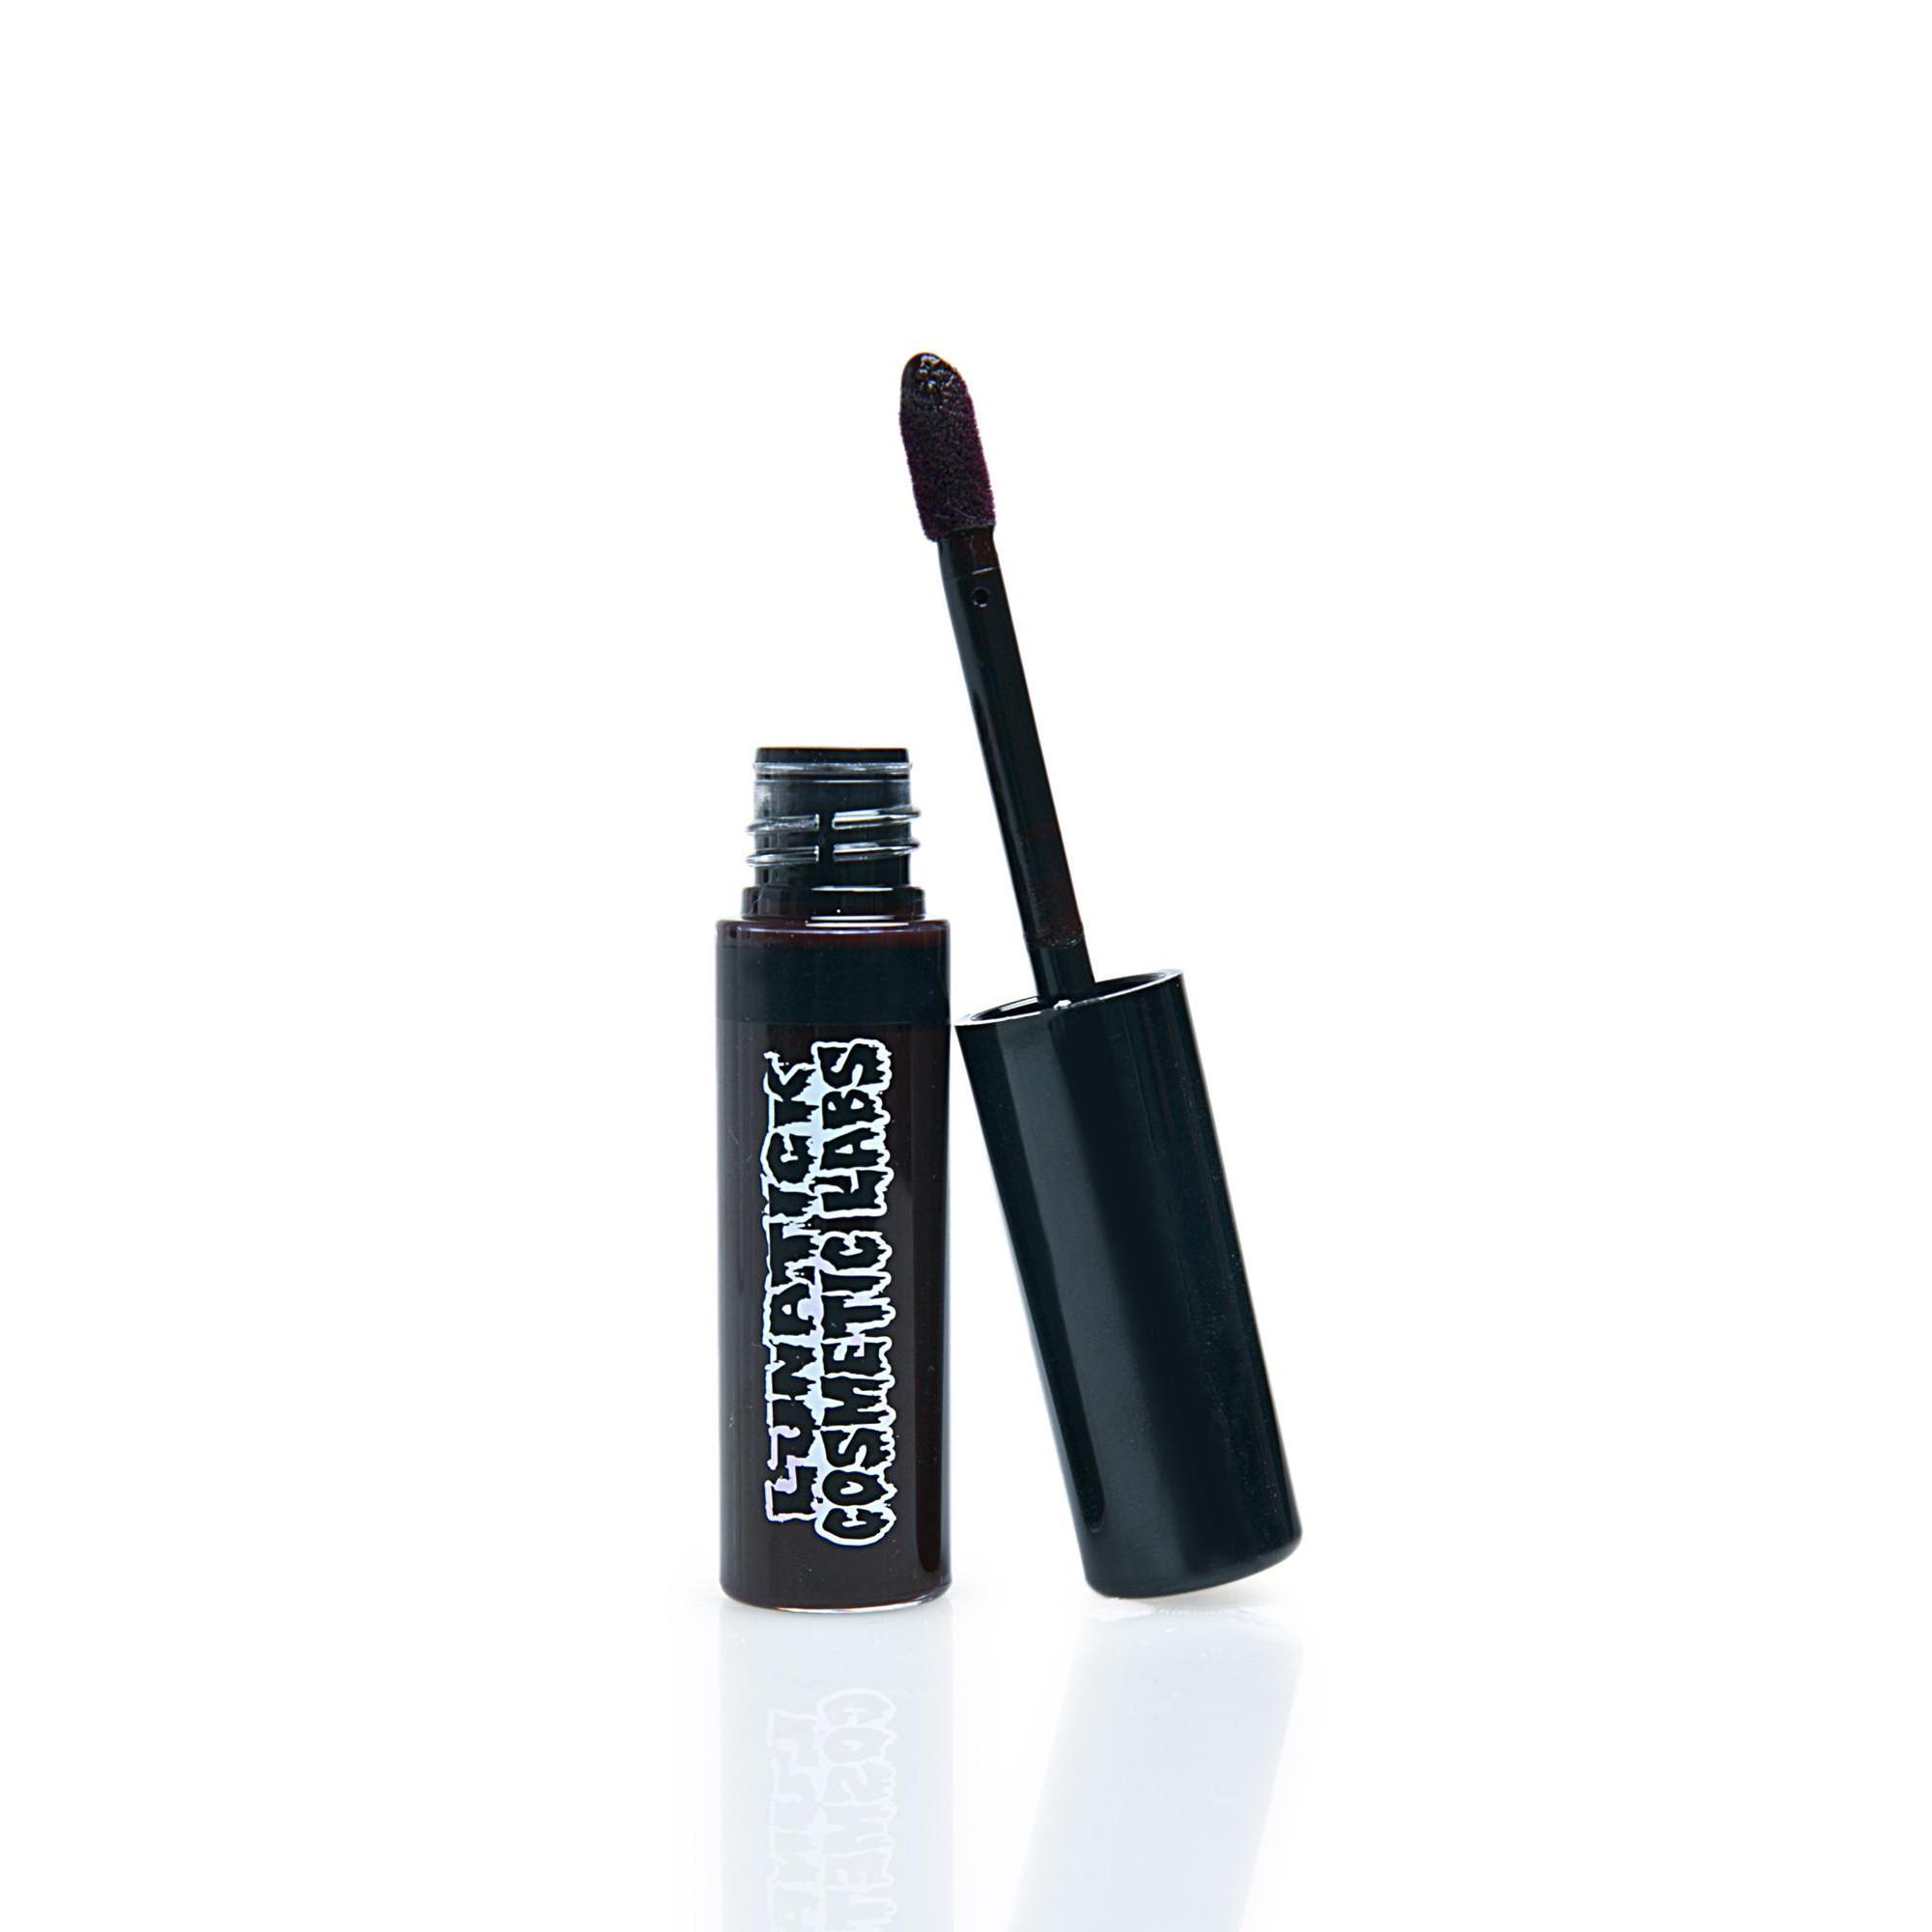 Lunatick Cosmetic Labs Lip Slick Tainted Temptress